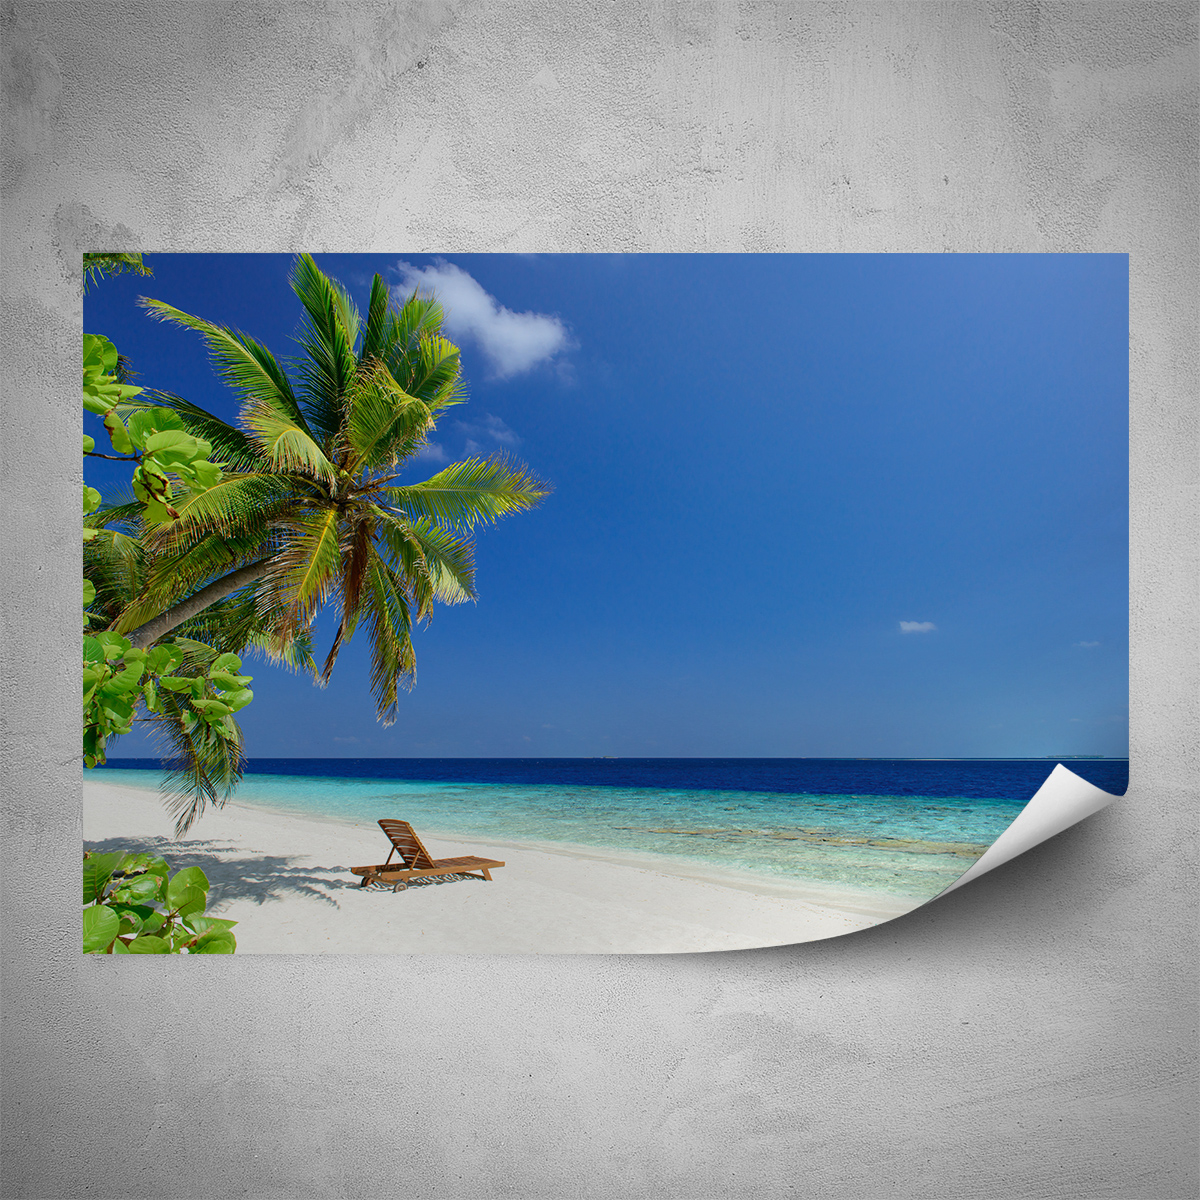 Plakát - Pláž Mauricius - 120x80 cm - PopyDesign